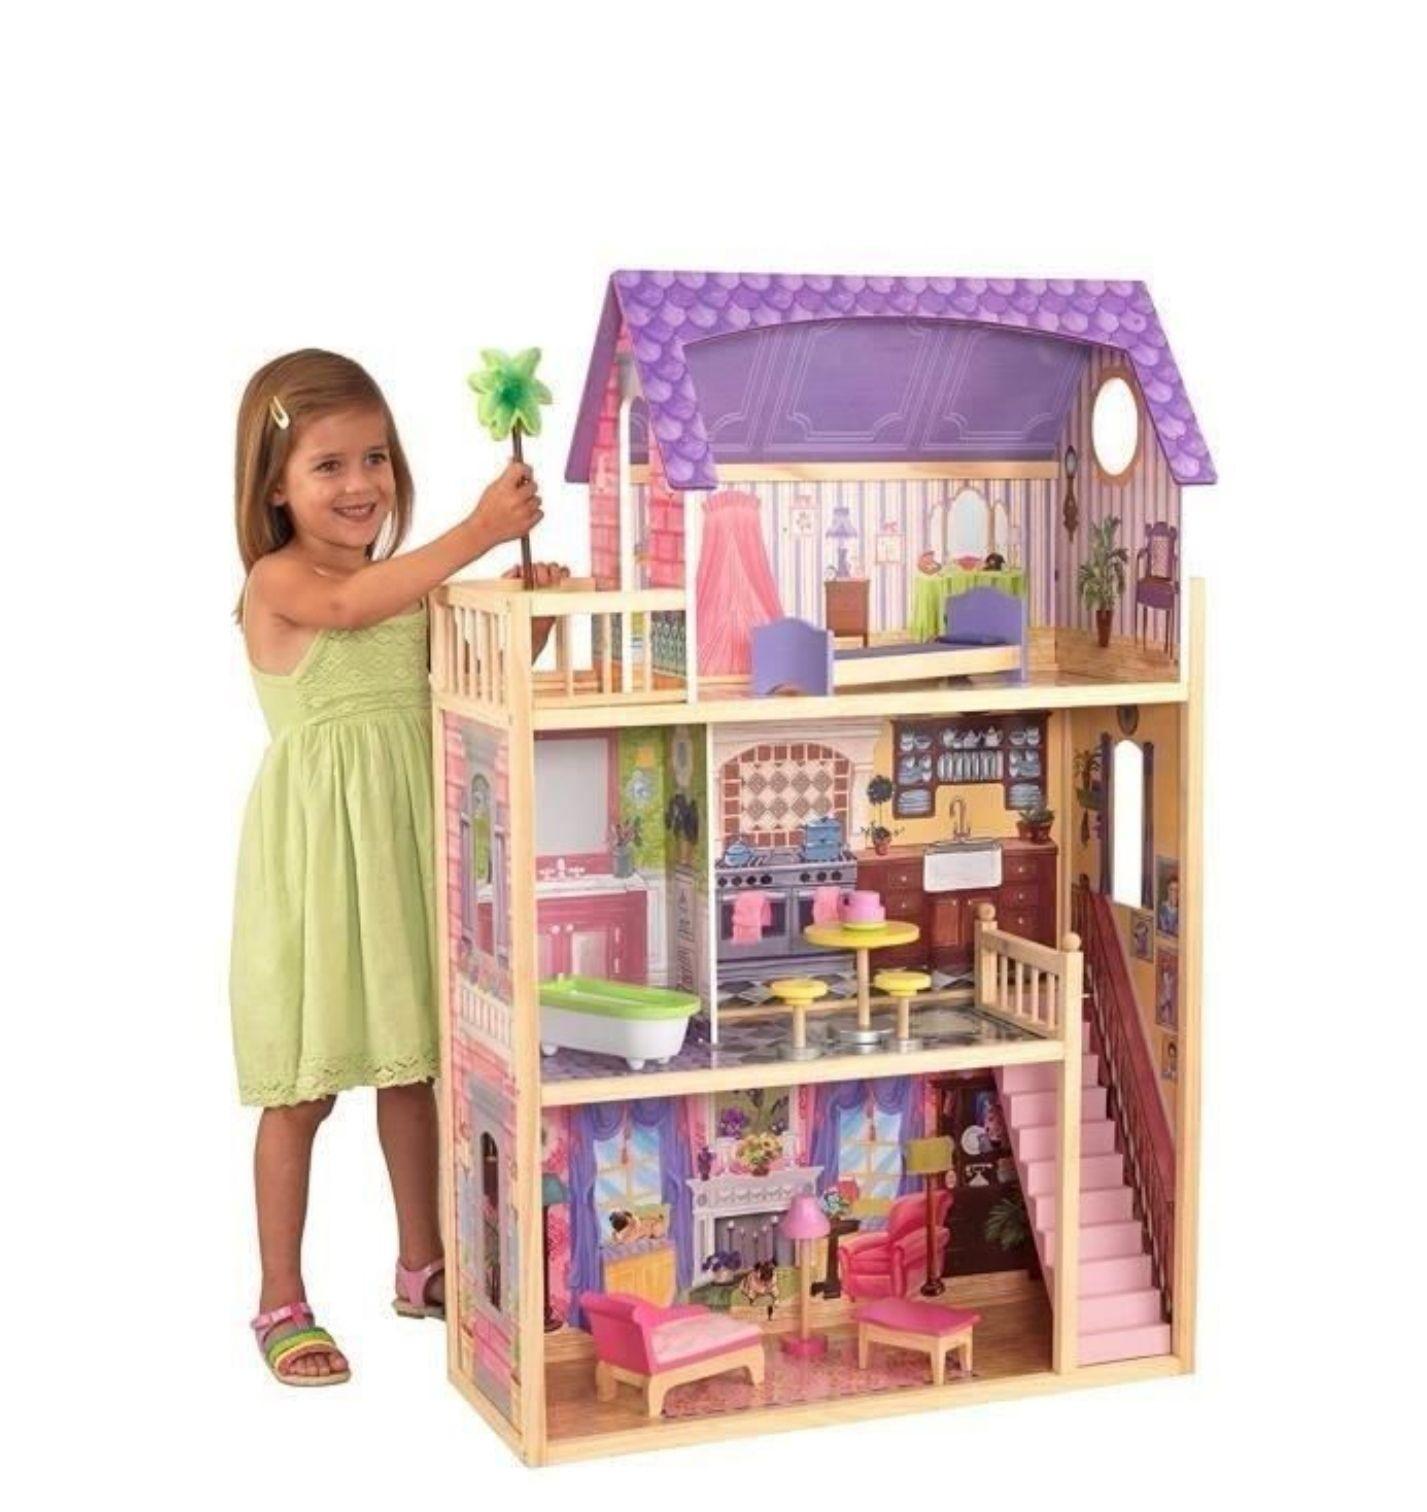 Maison de poupées en bois Kidkraft Kayla